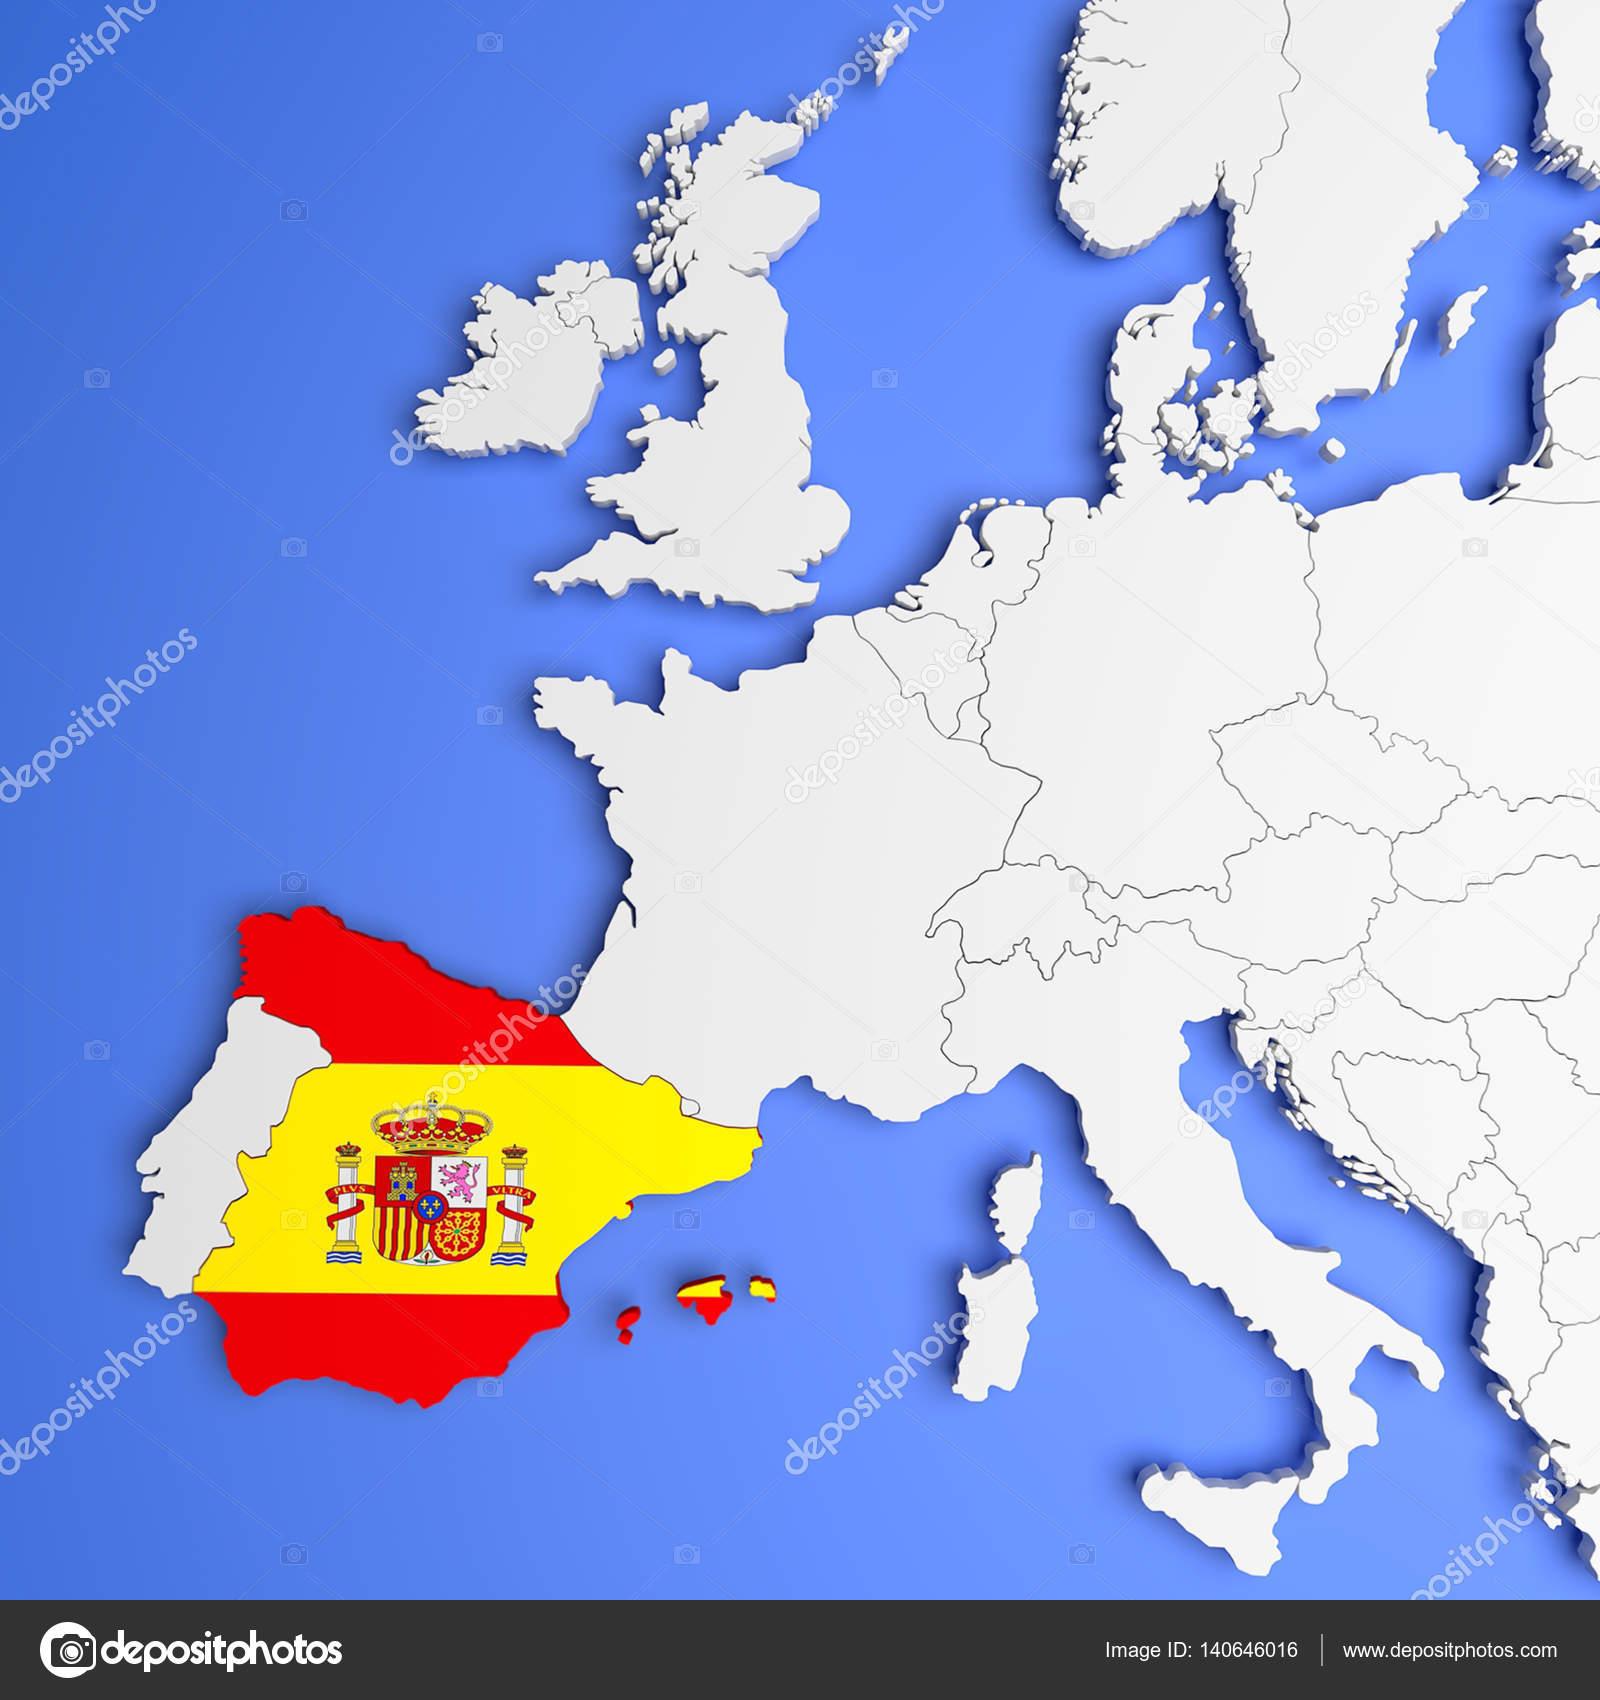 Carte Espagne Telecharger.3d Carte Espagne Photographie Malewitch C 140646016